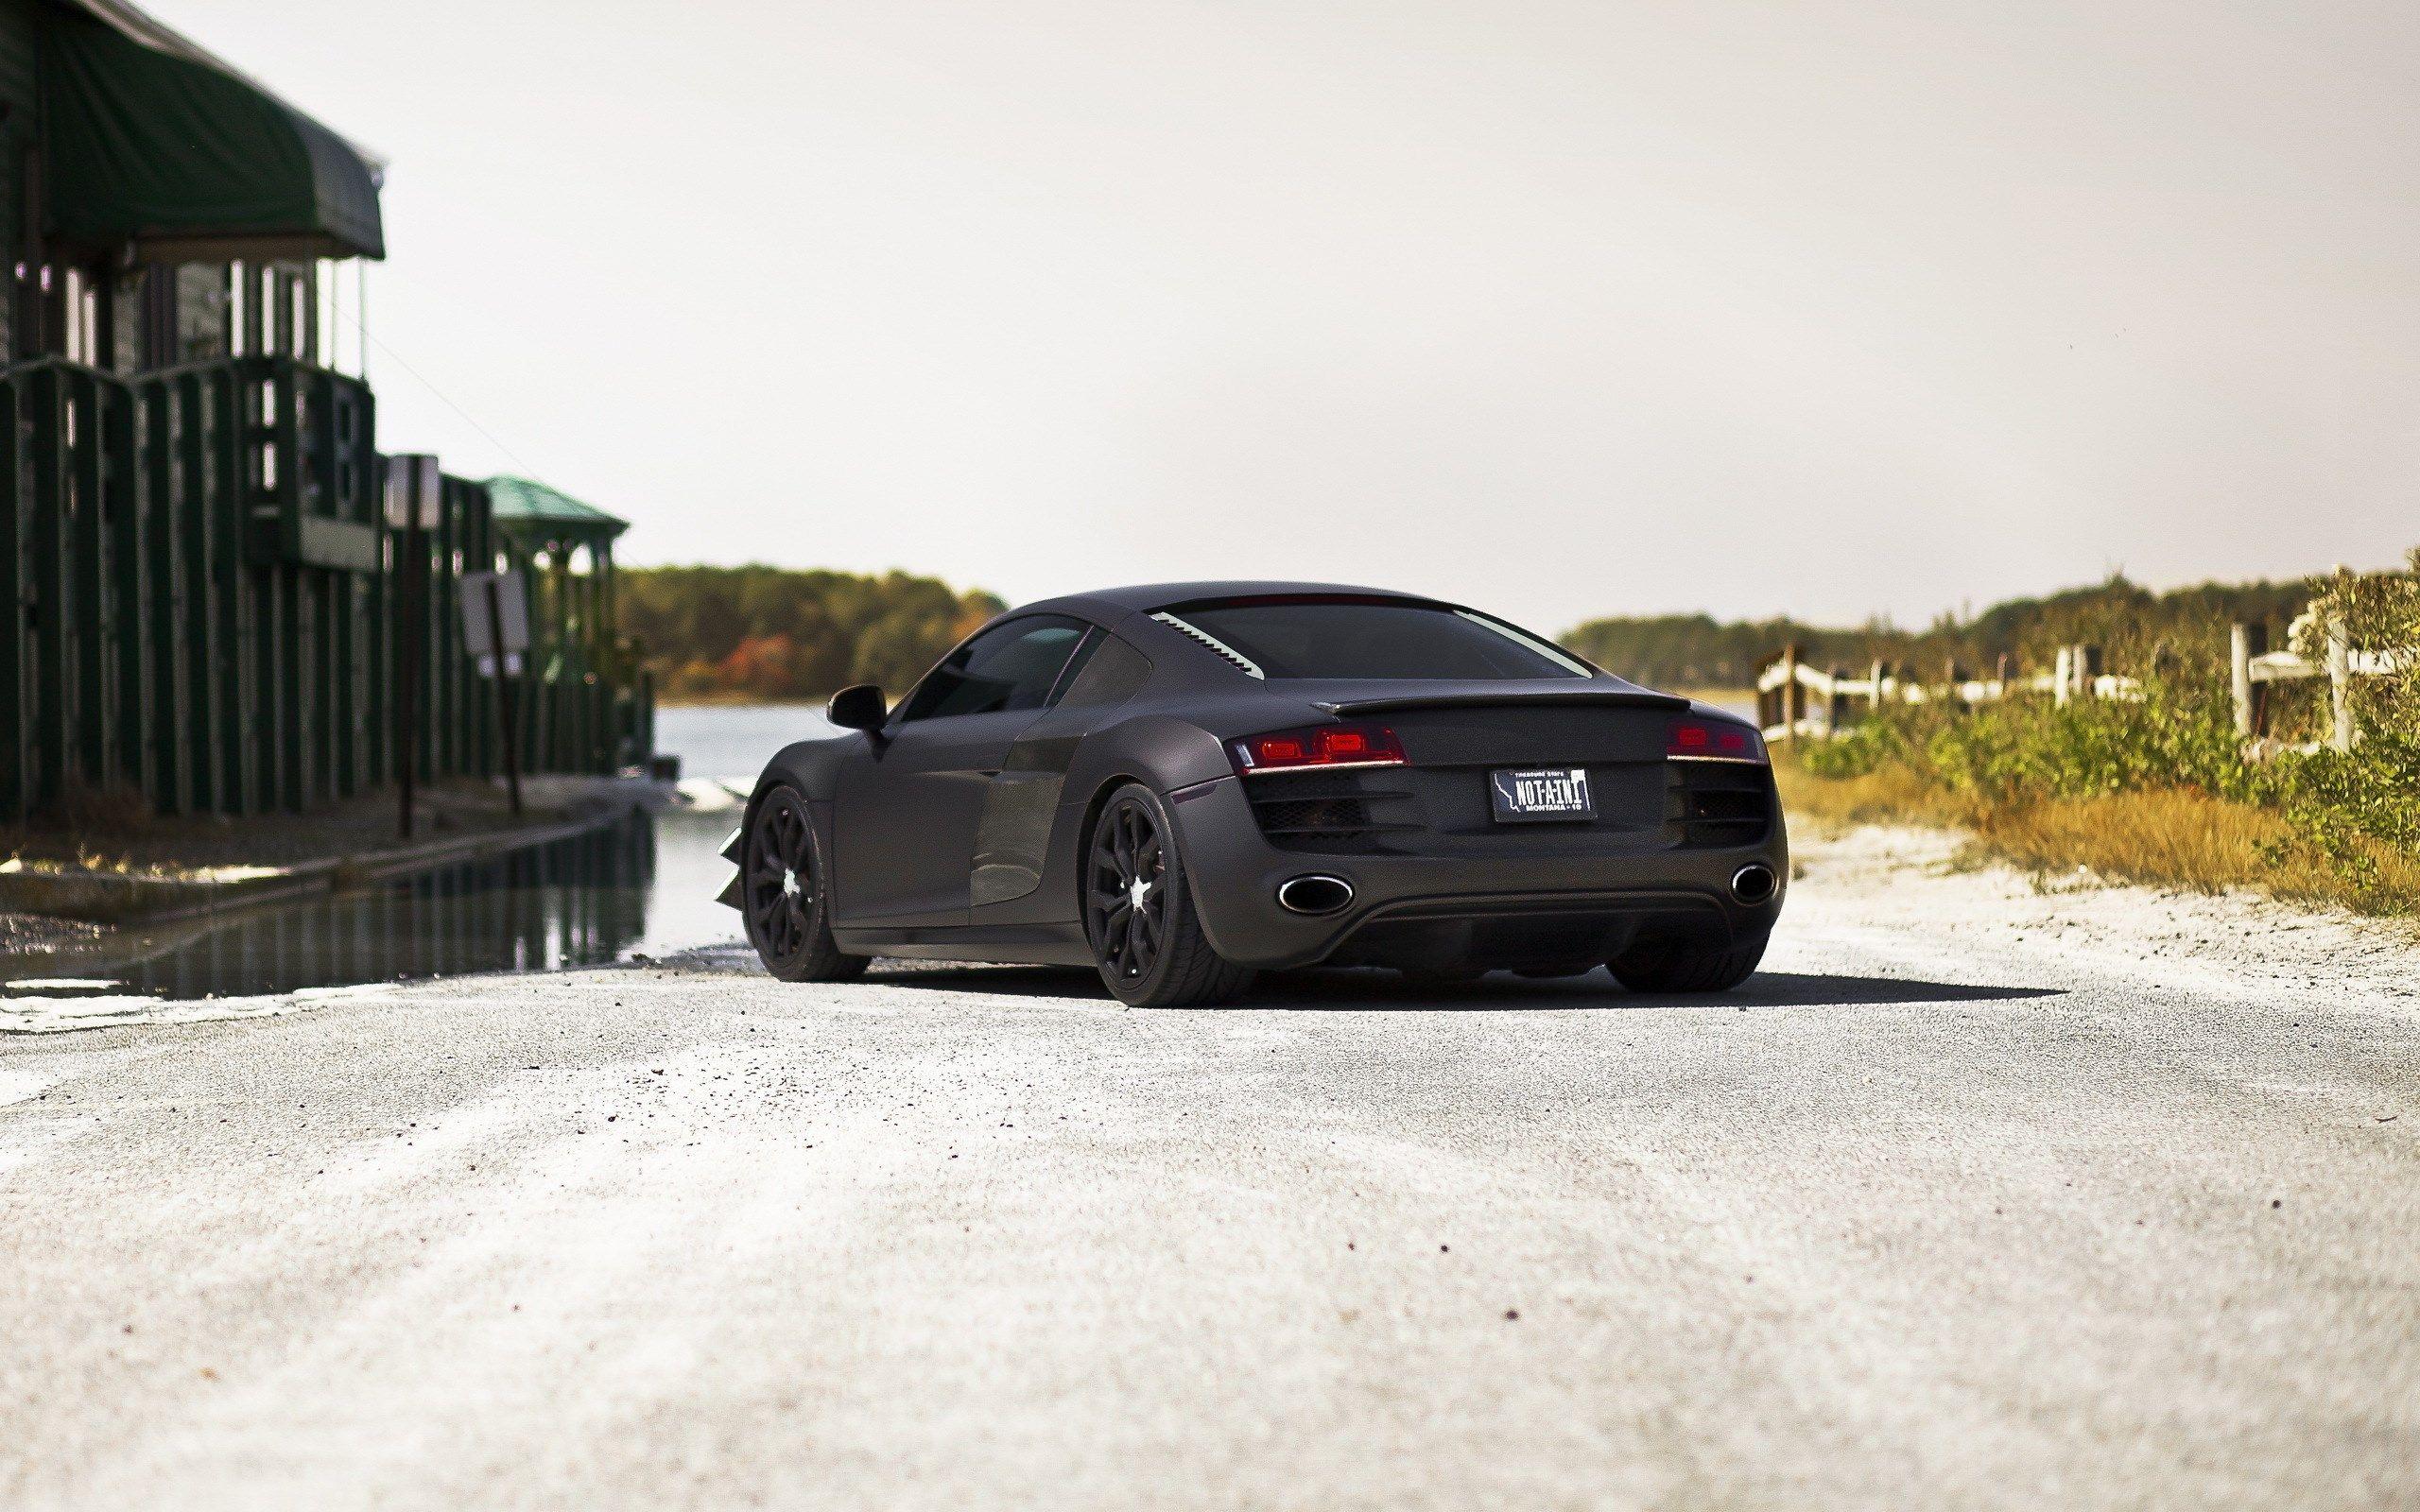 Audi R8 Matte Black Hd Wallpaper Audi R8 Audi R8 Wallpaper Audi